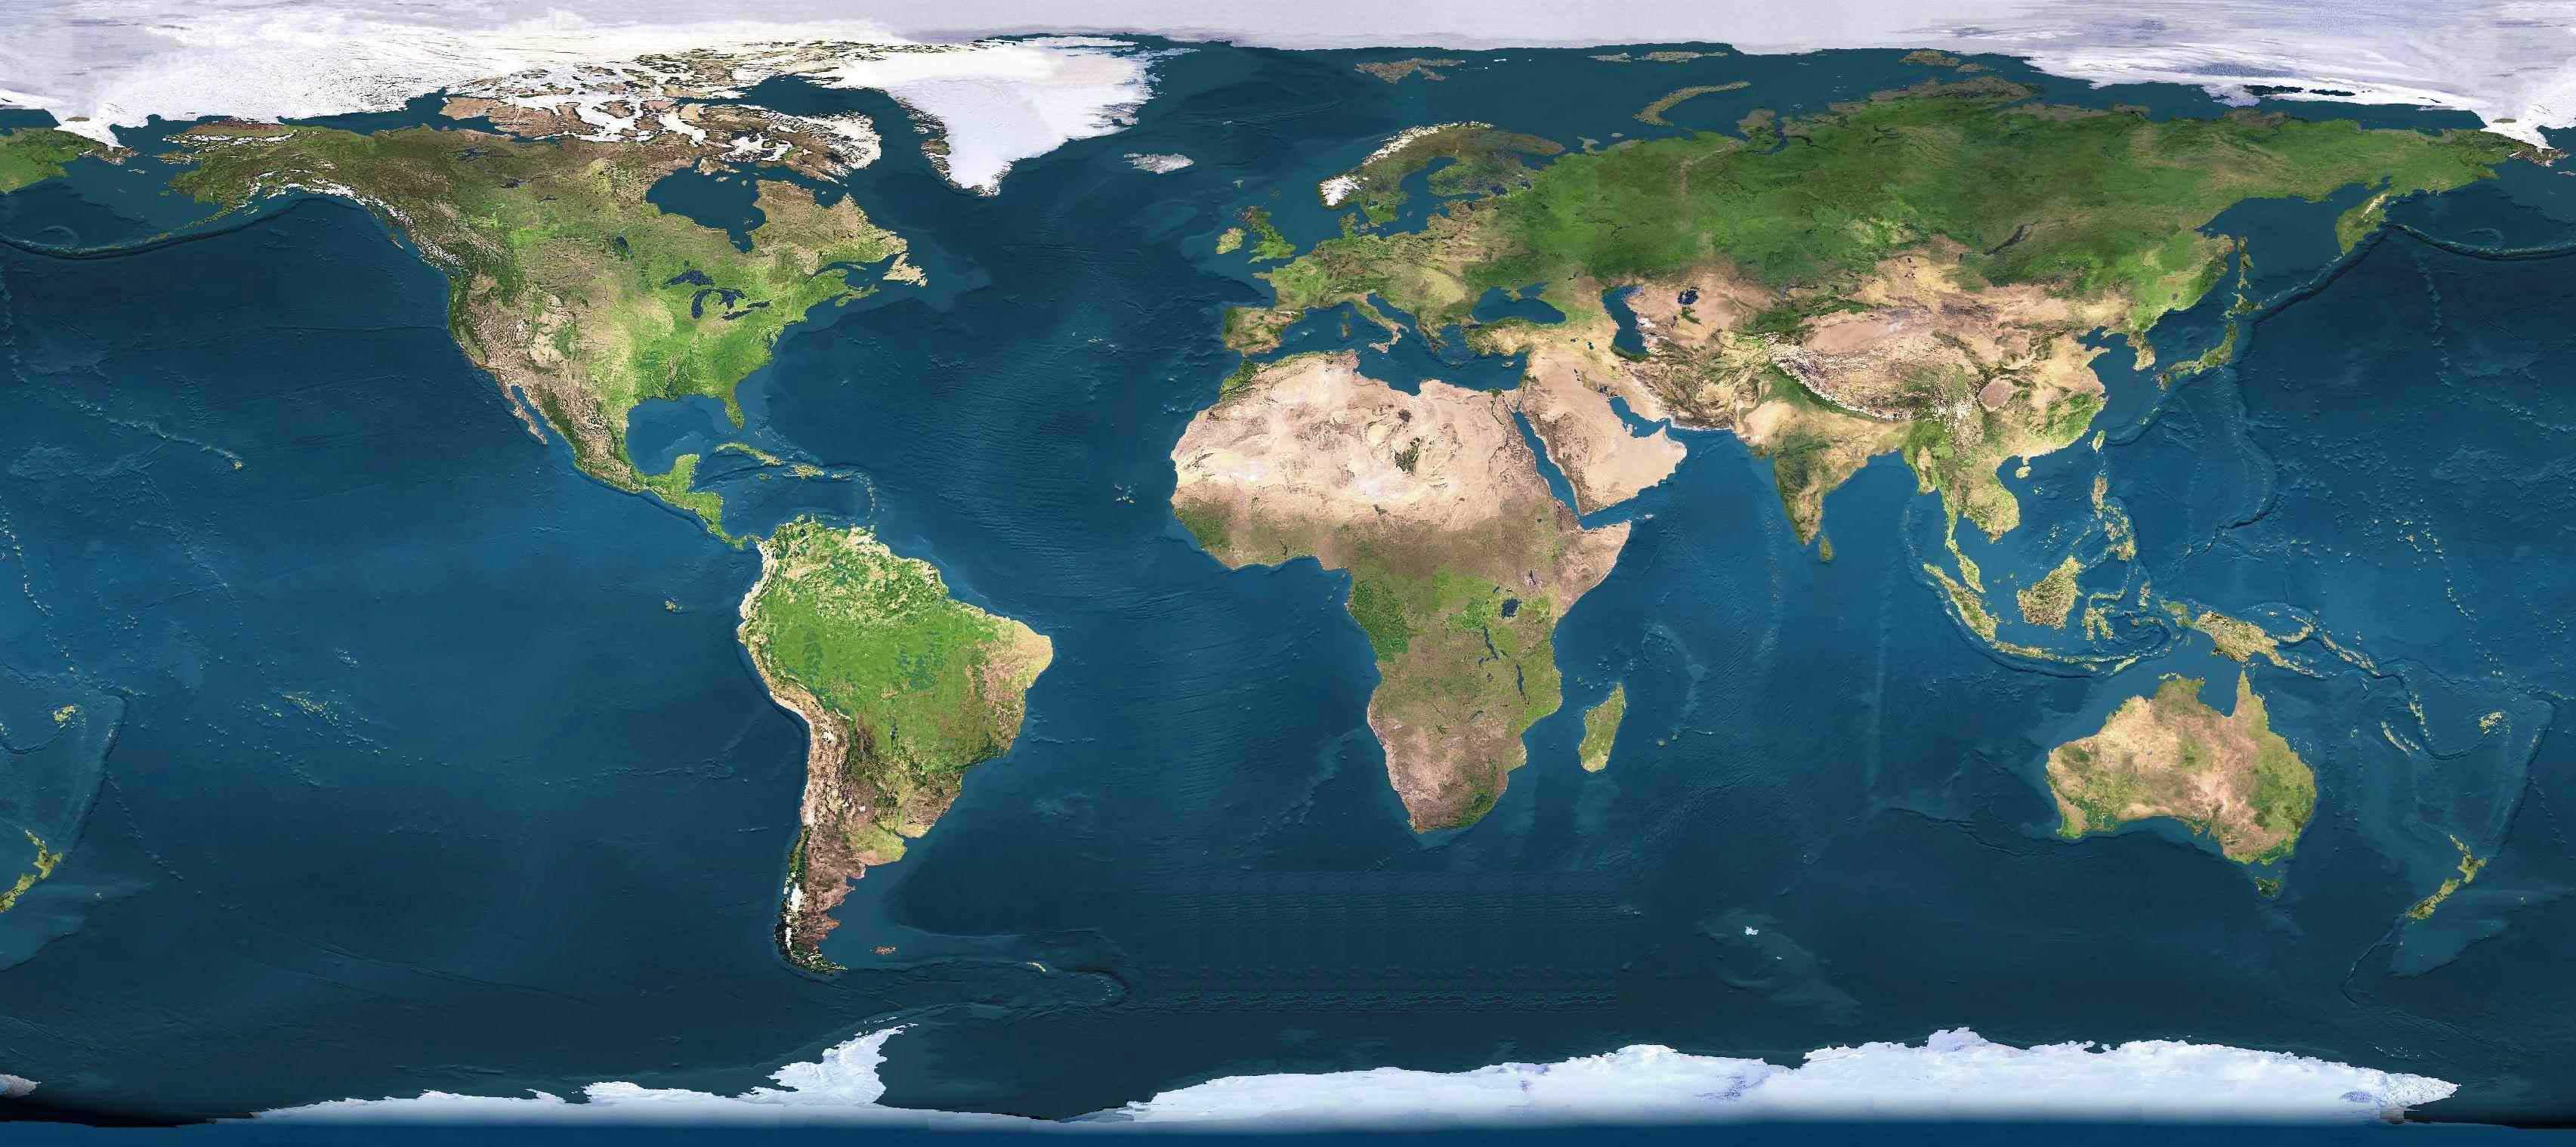 World Map Satellite View